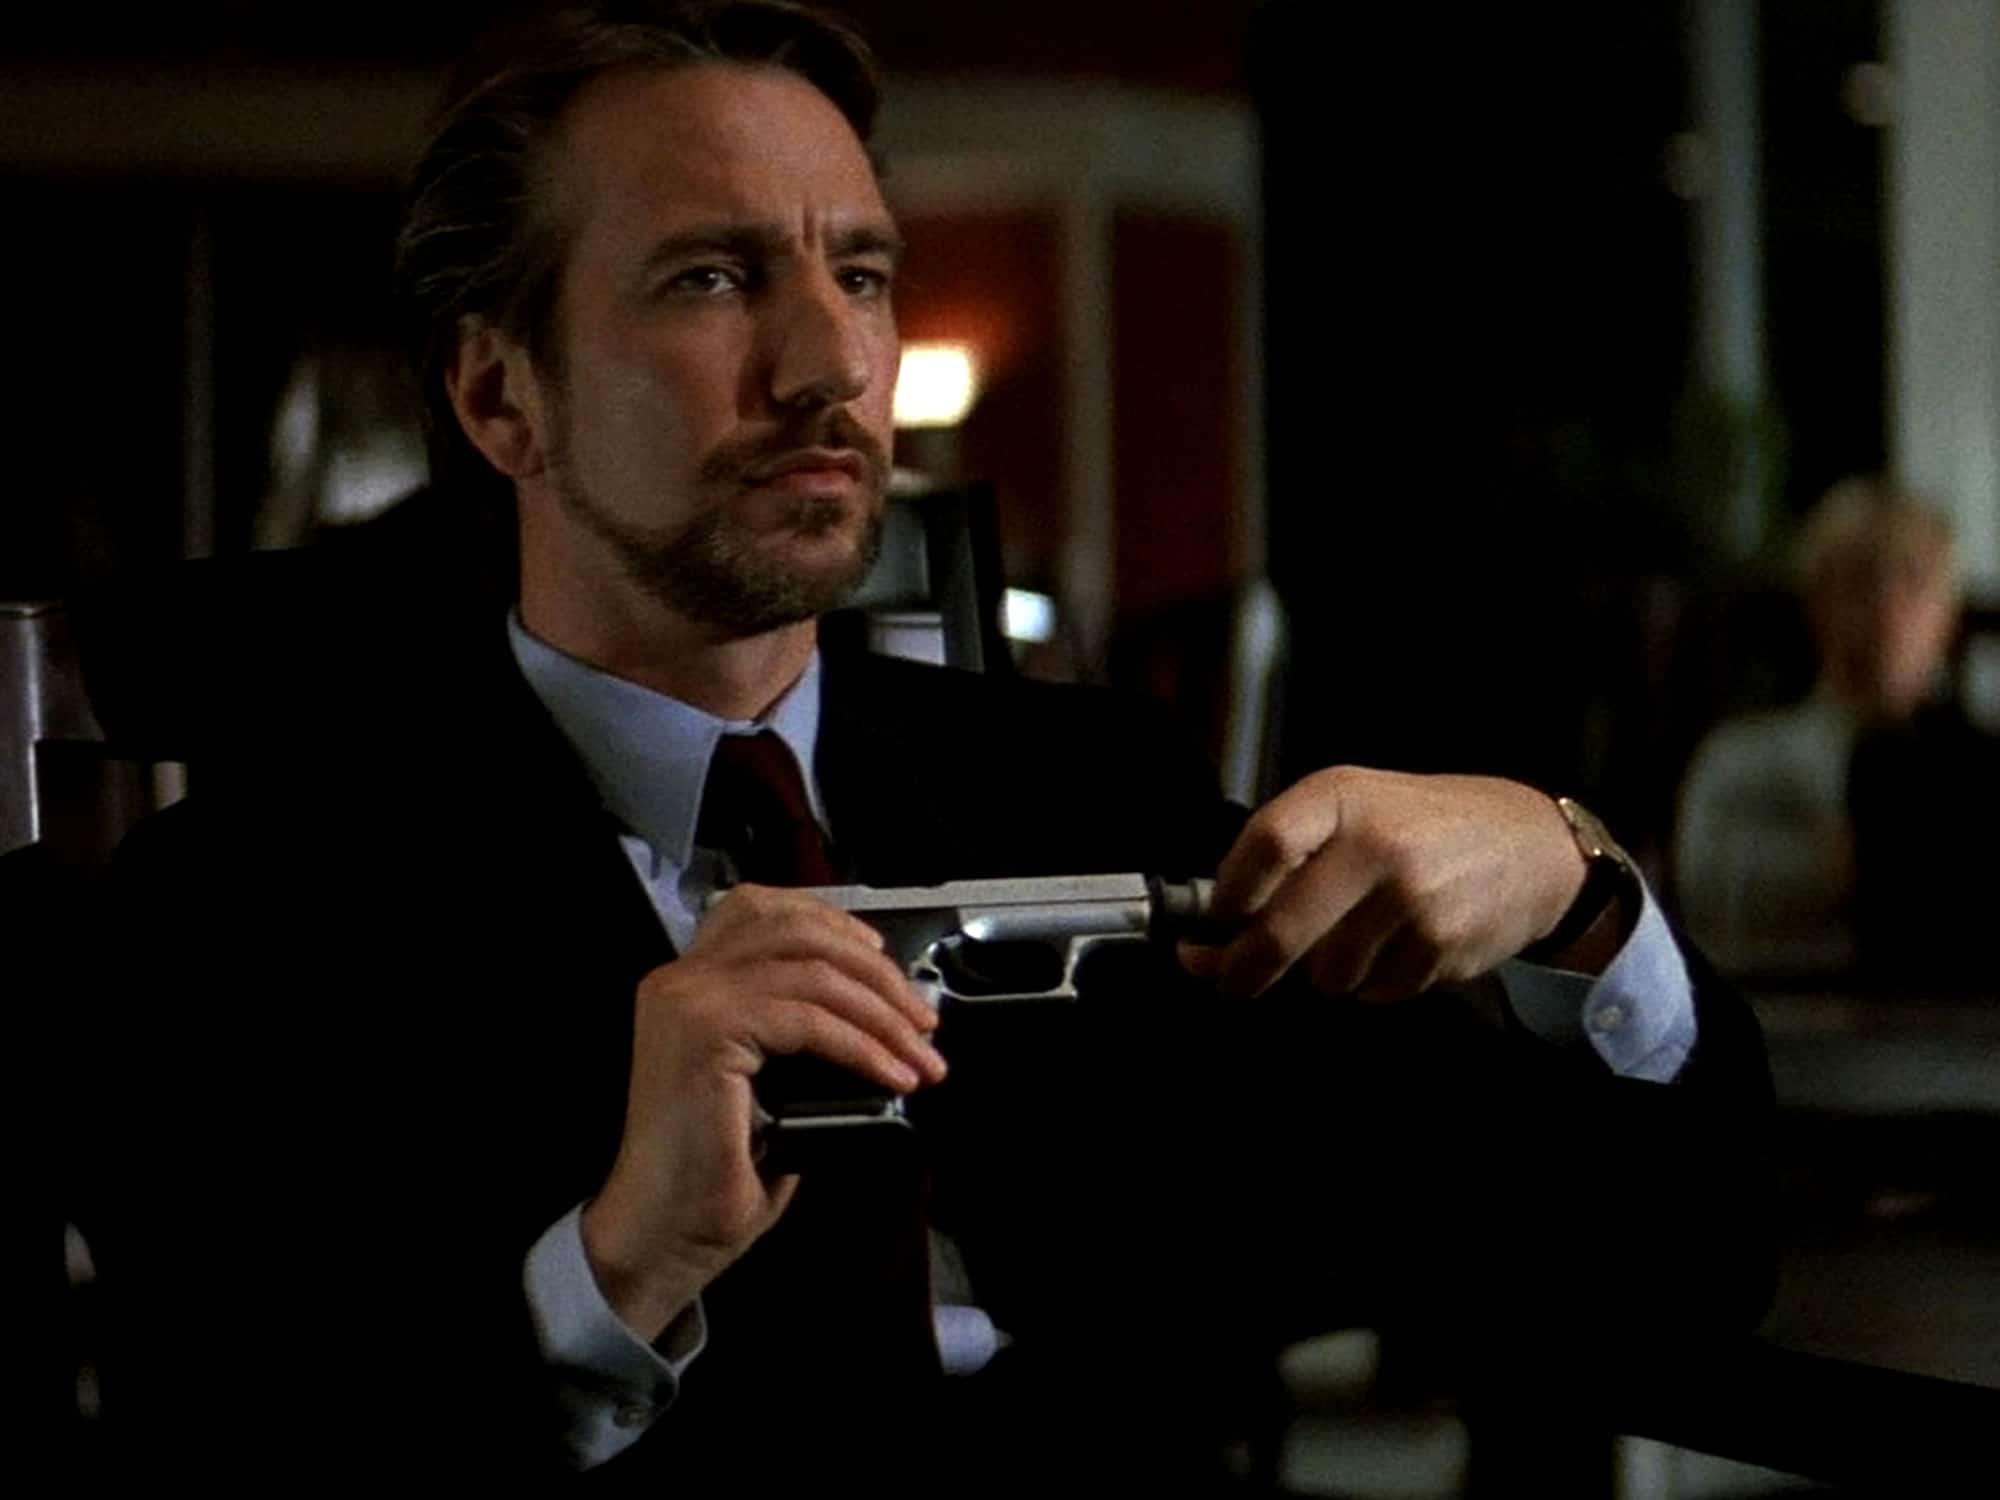 Alan Rickman as the villainous Hans Gruber in Die Hard